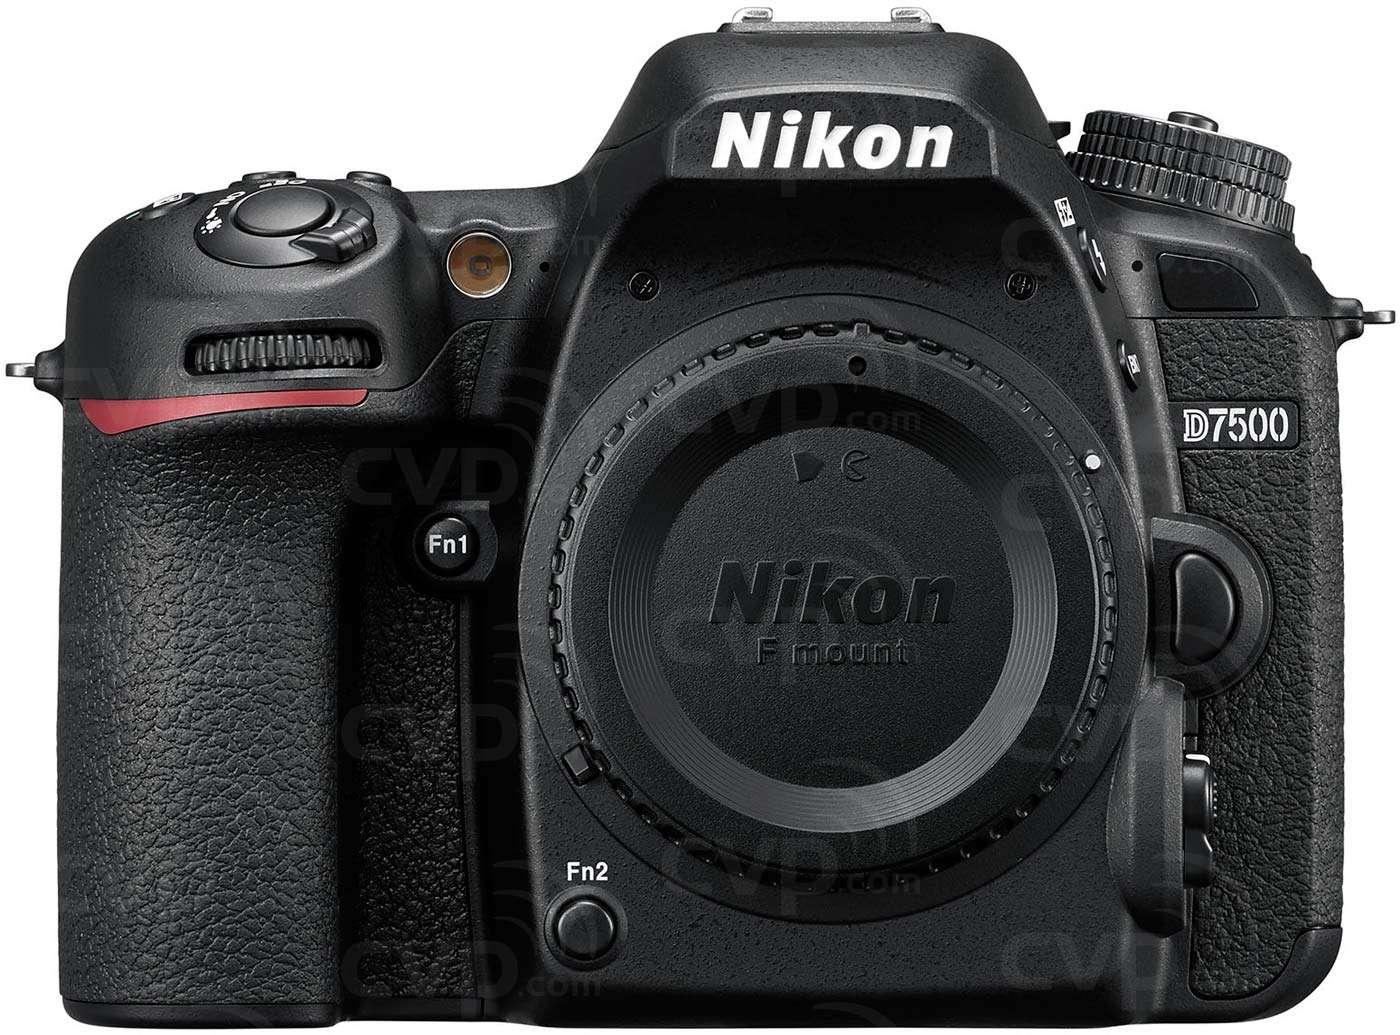 Nikon D7500 20.9 Megapixel DX-format Digital SLR Camera - Body